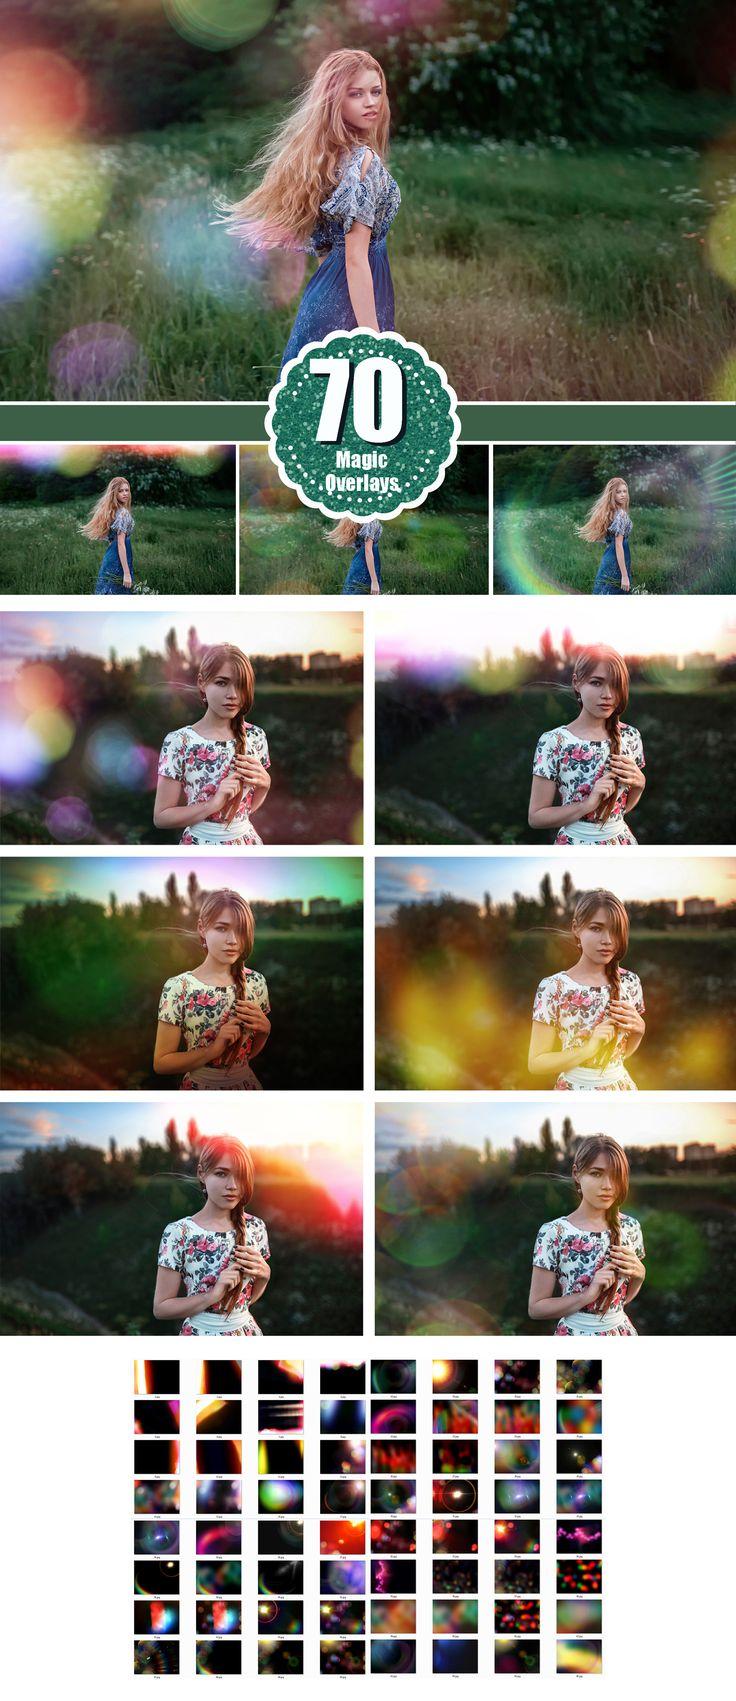 Lens Flare Solar, Rainbow Rays, Sun Lens Overlays, Natural Light, Halo Photo Effect, Film Light Leak Layer, Sun beams and streaks bokeh